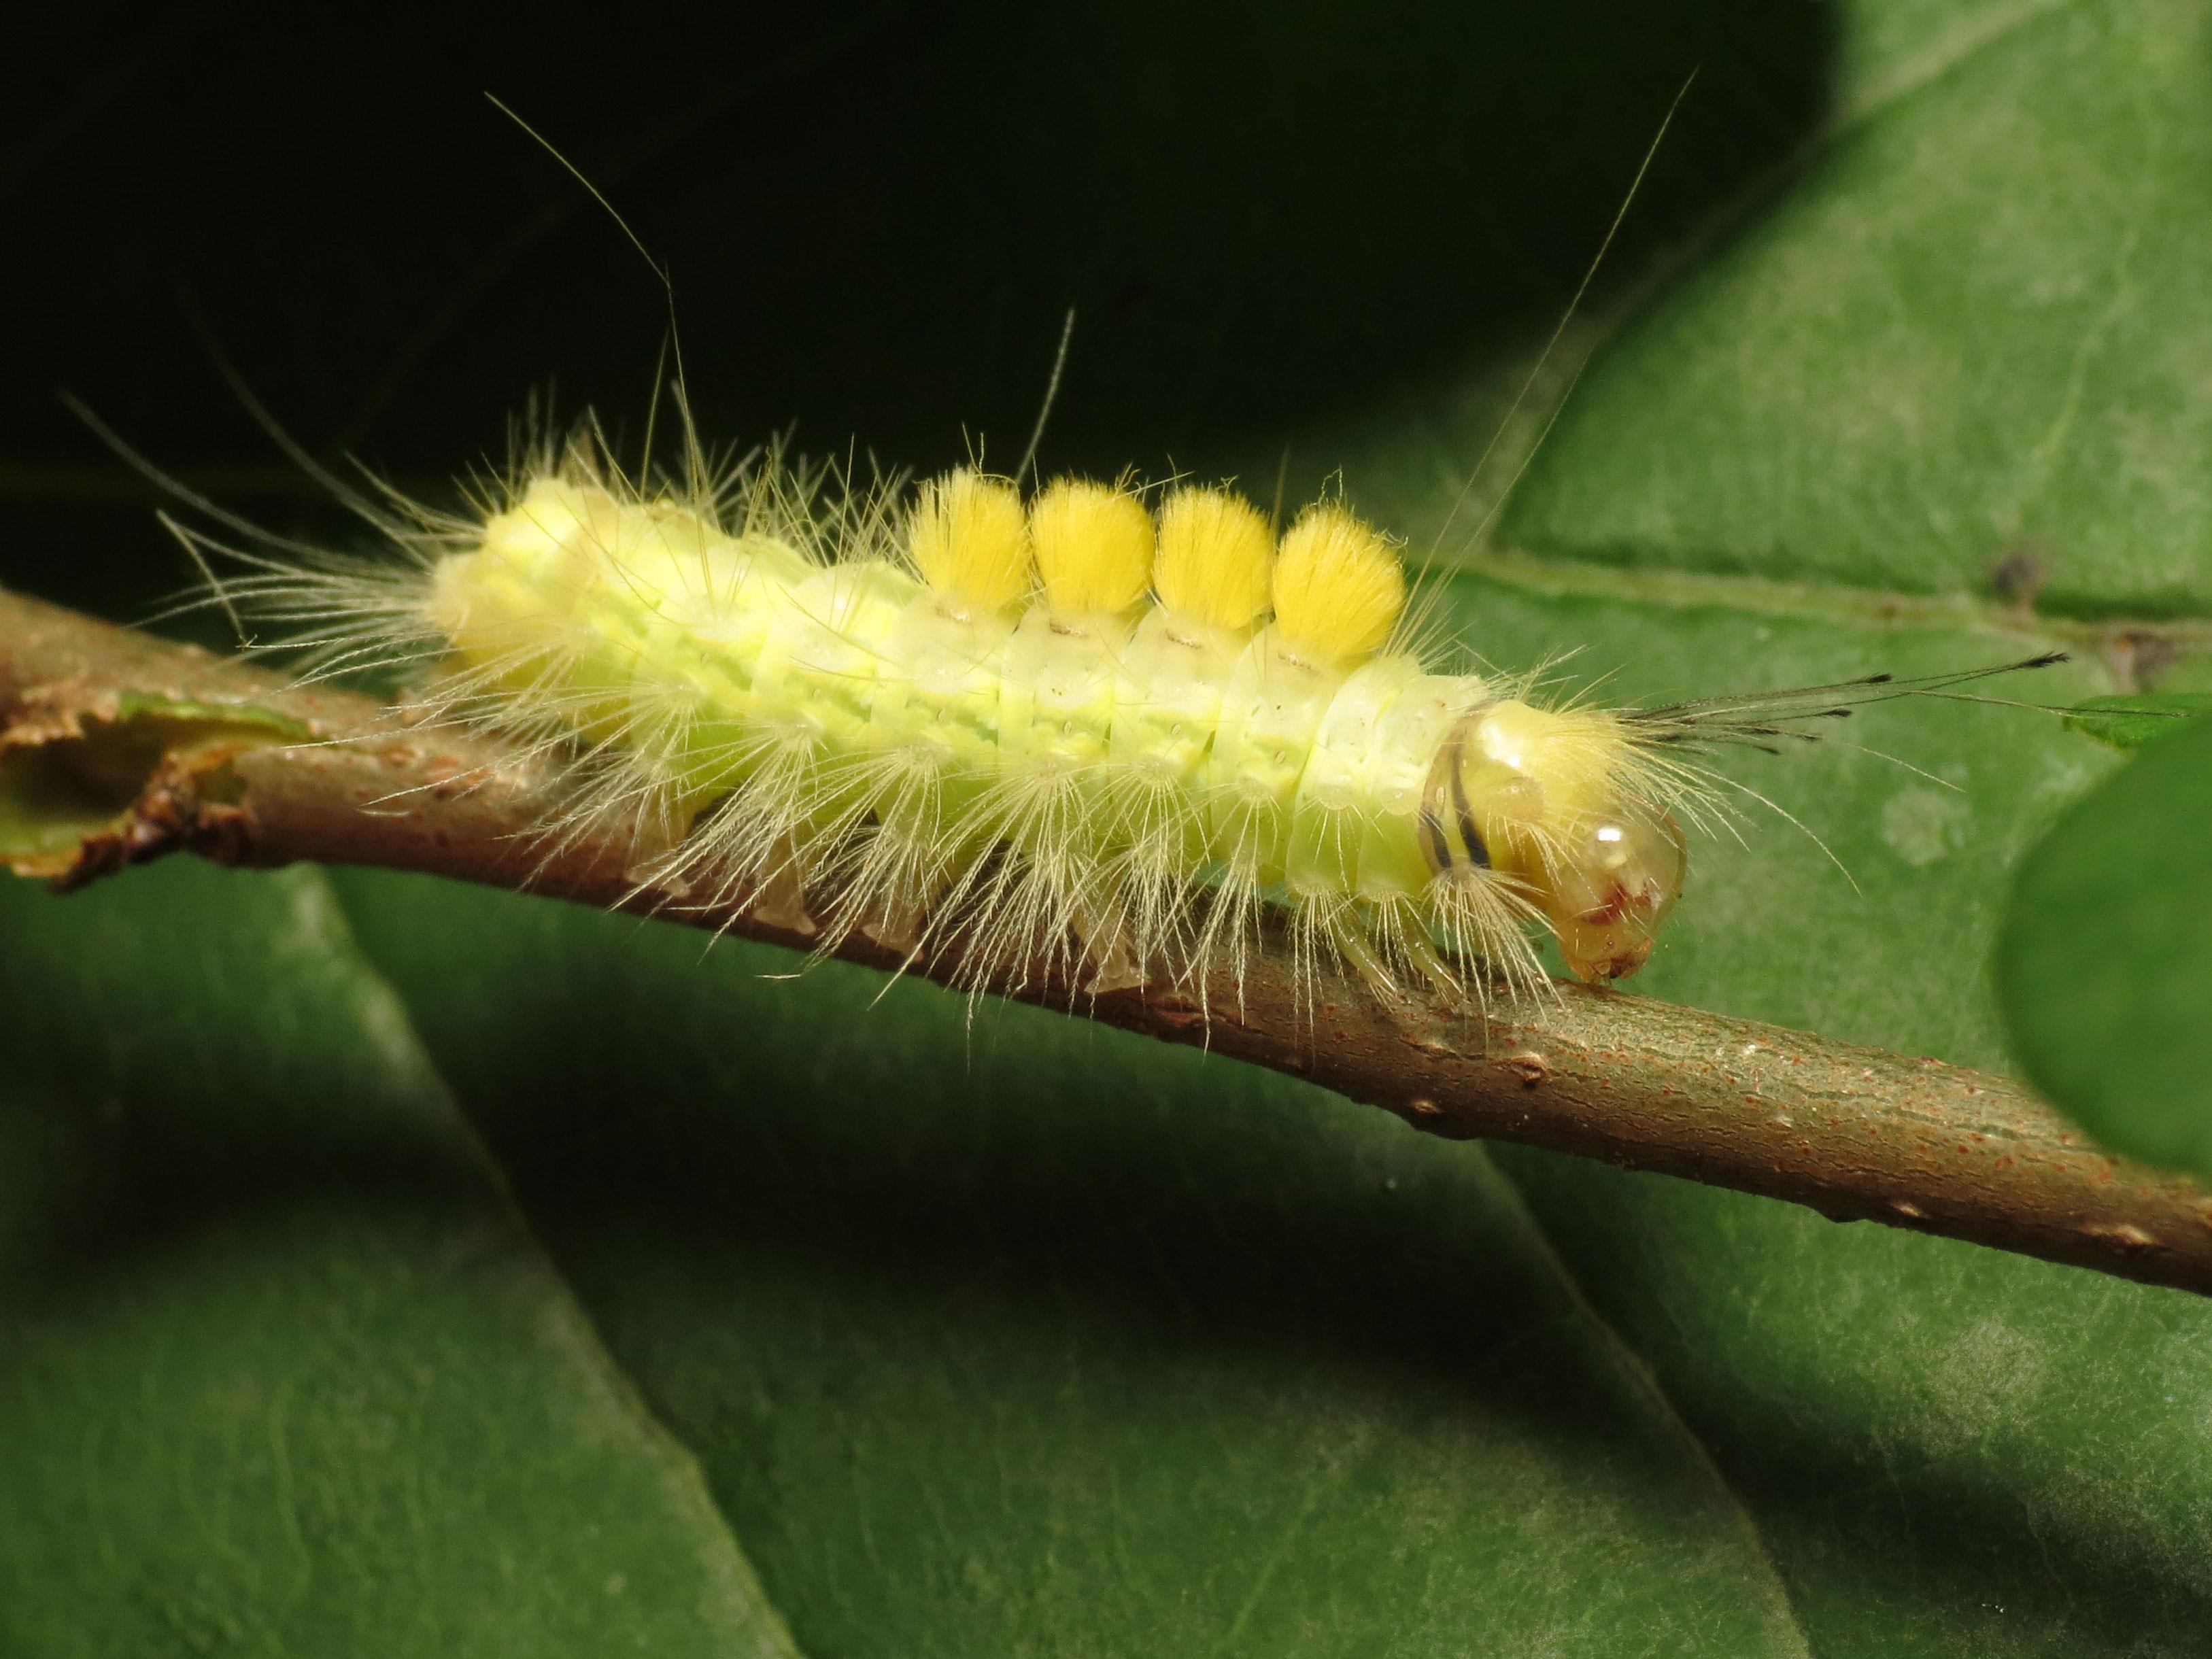 File:Definite Tussock Moth Caterpillar (15381081537).jpg - Wikimedia Commons